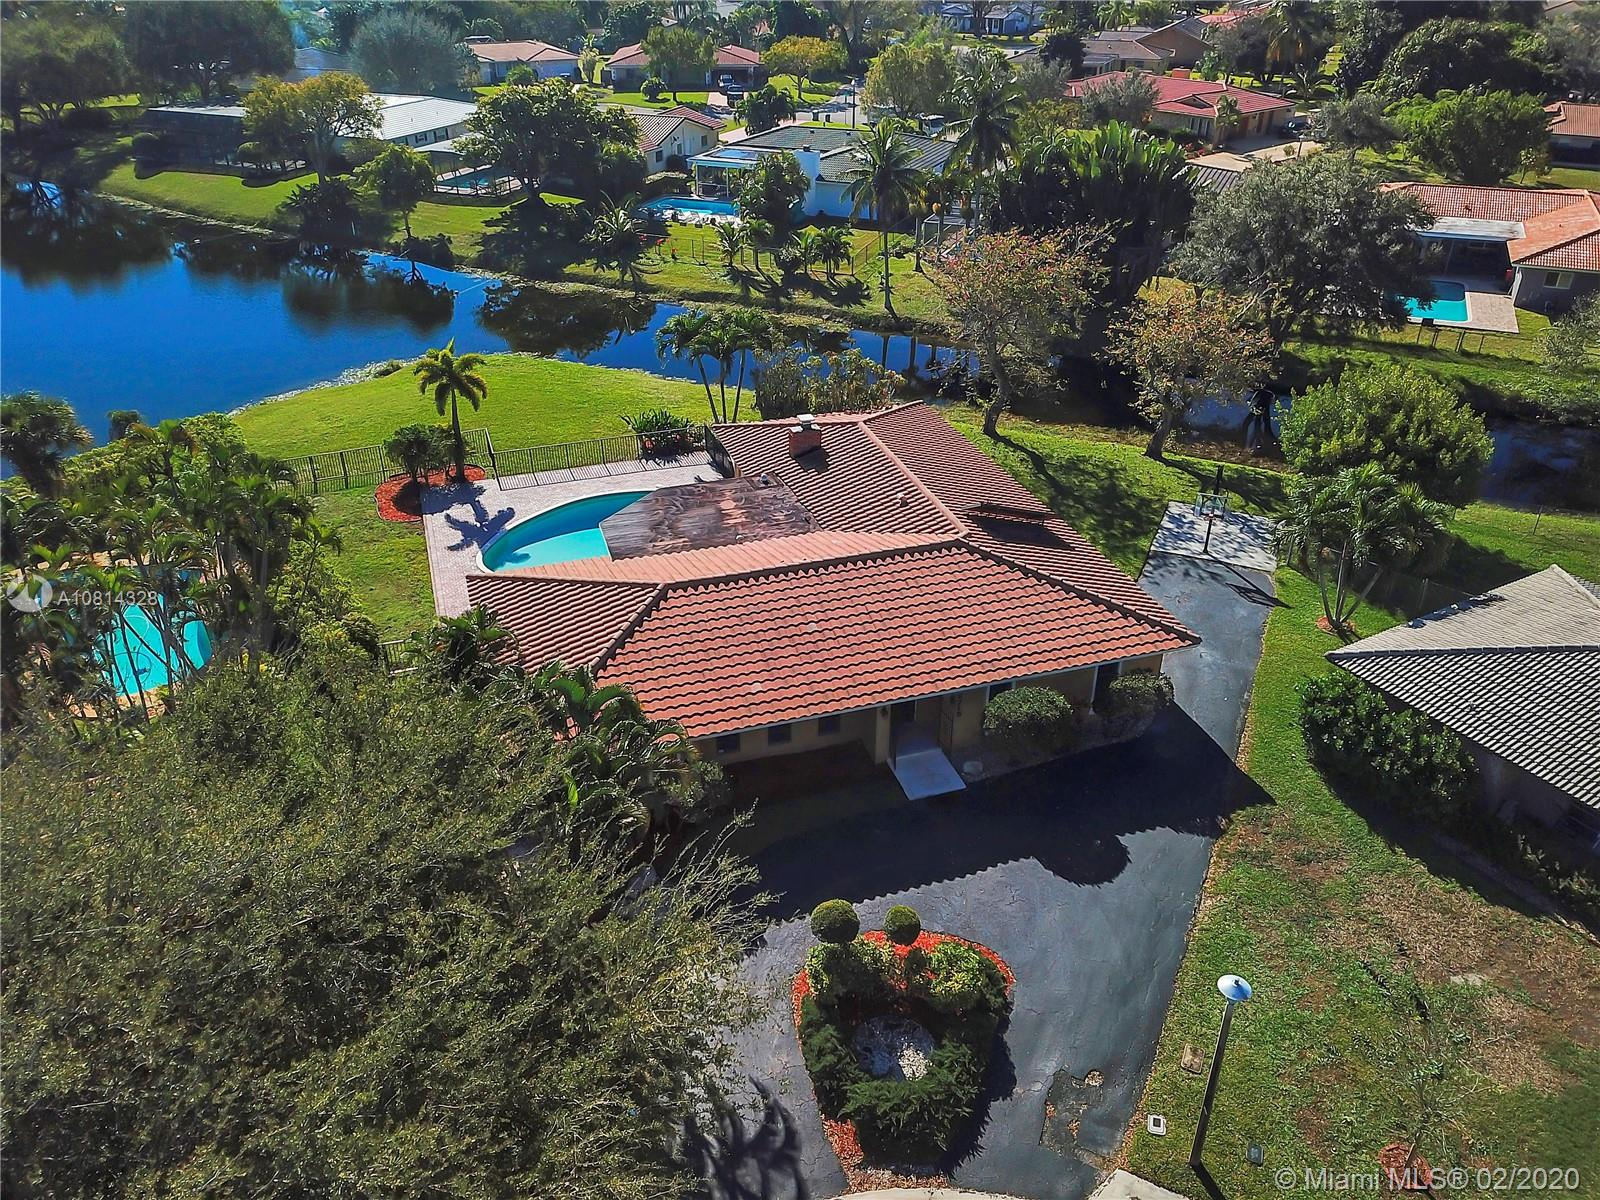 2715 NW 86th Way, Coral Springs, FL 33065 - Coral Springs, FL real estate listing